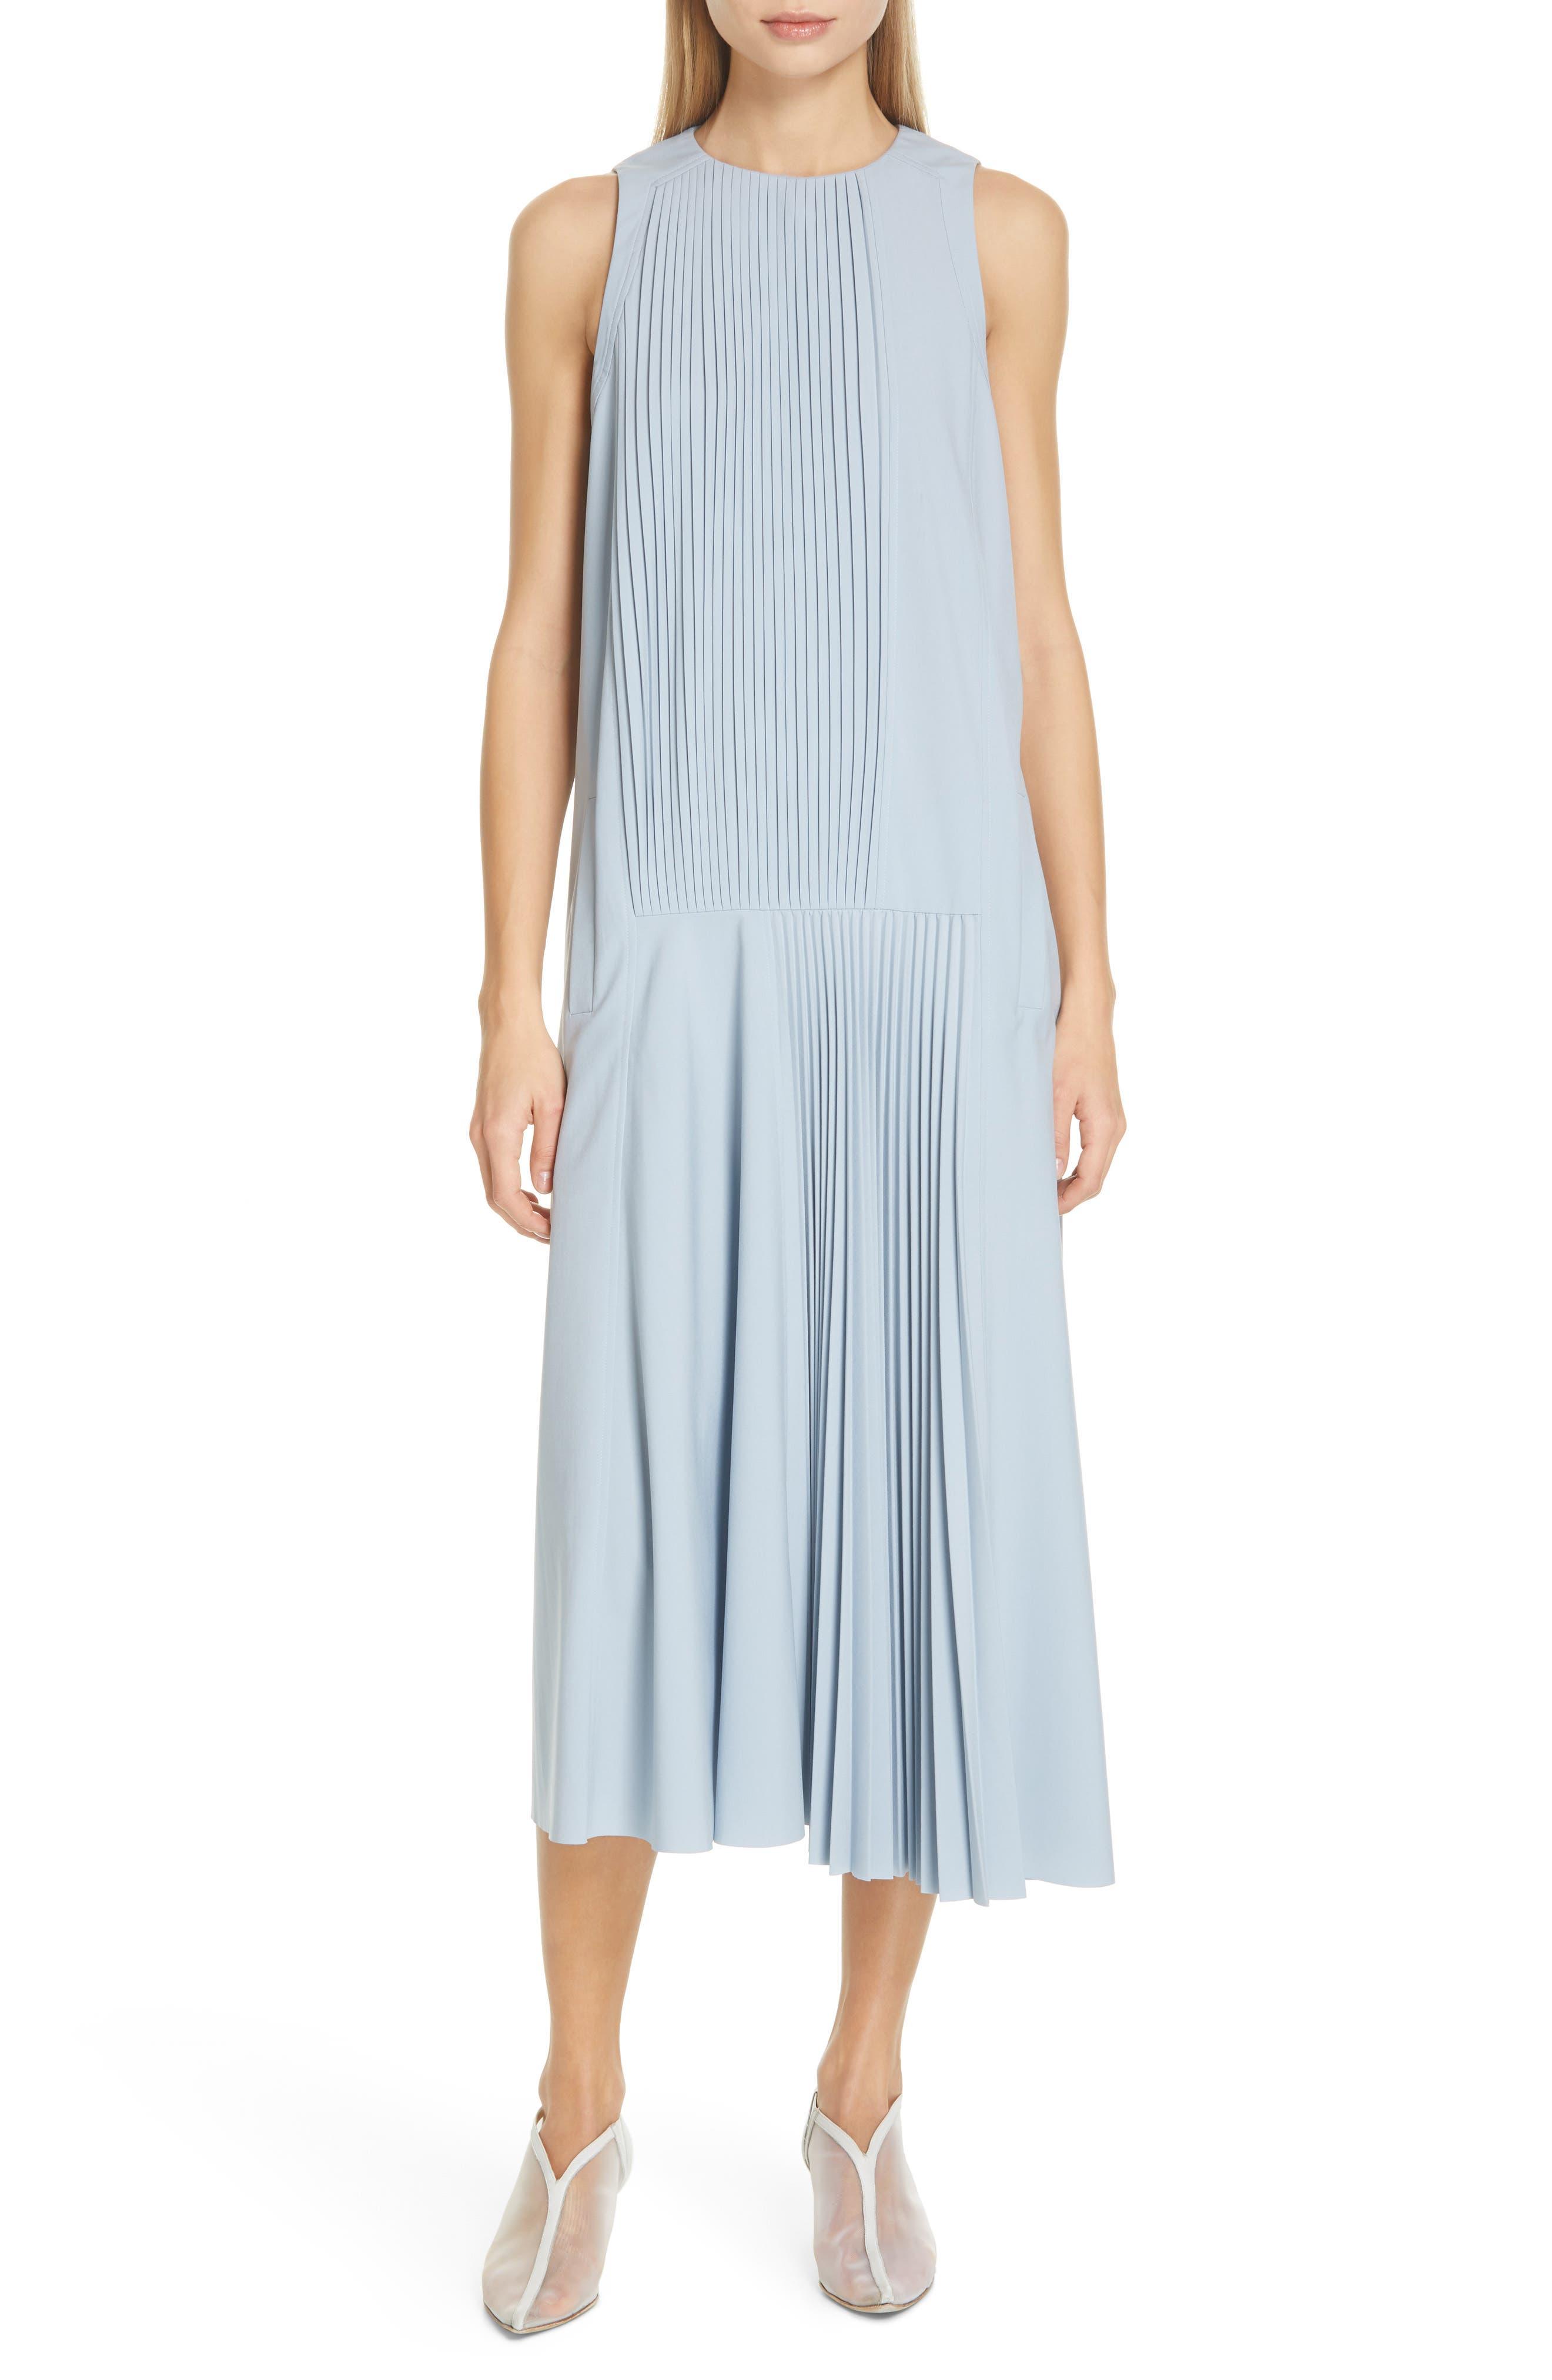 Tibi Edith Pleat Asymmetrical Midi Dress, Grey